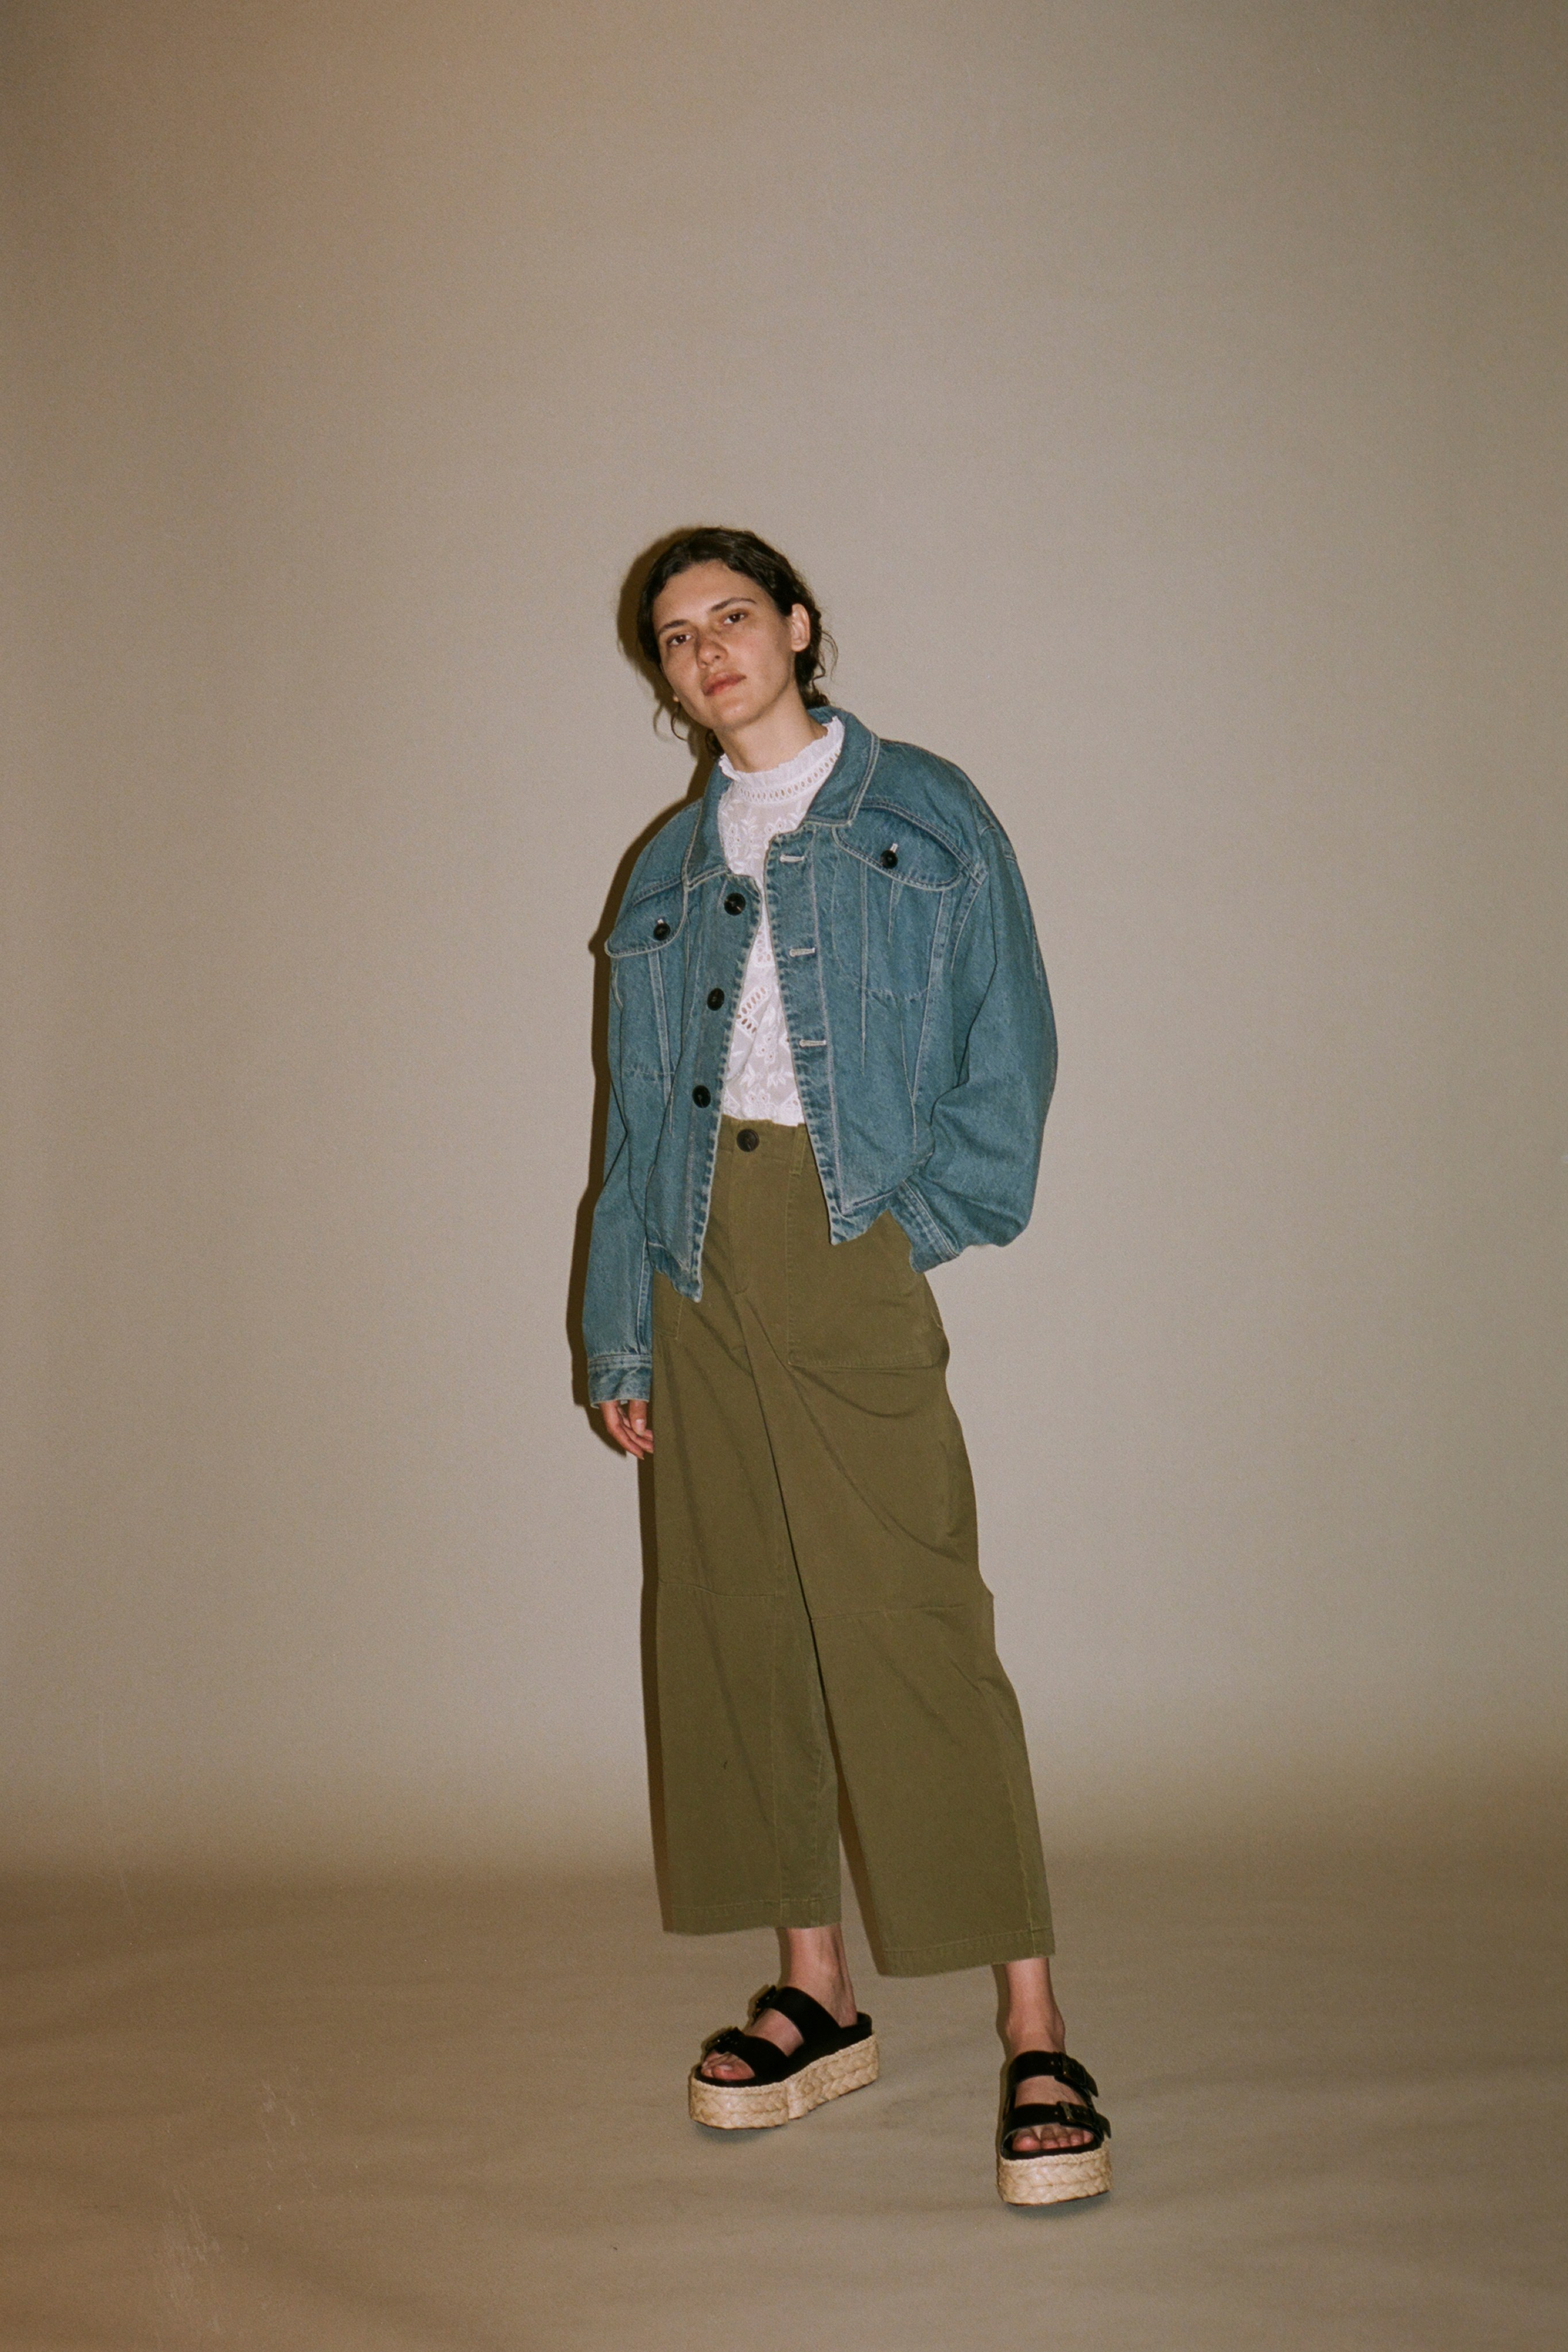 Doreen denim jacket, zippy eyelet long sleeve blouse, Adalene pant